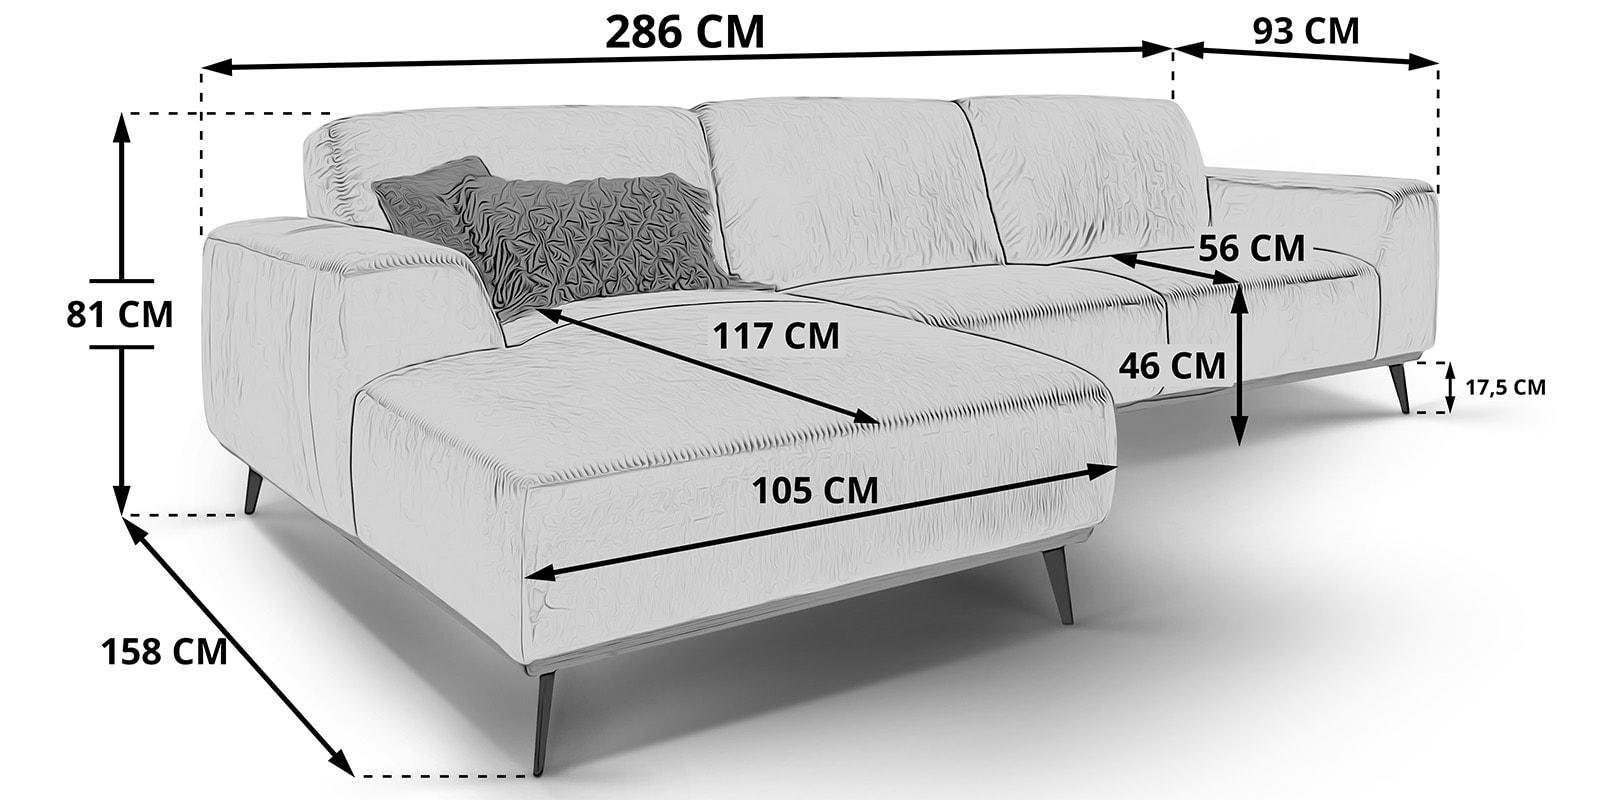 Moebella24 - Ecksofa - mit - Ottomane - Skizze - Maße - Skandinavisches - Design